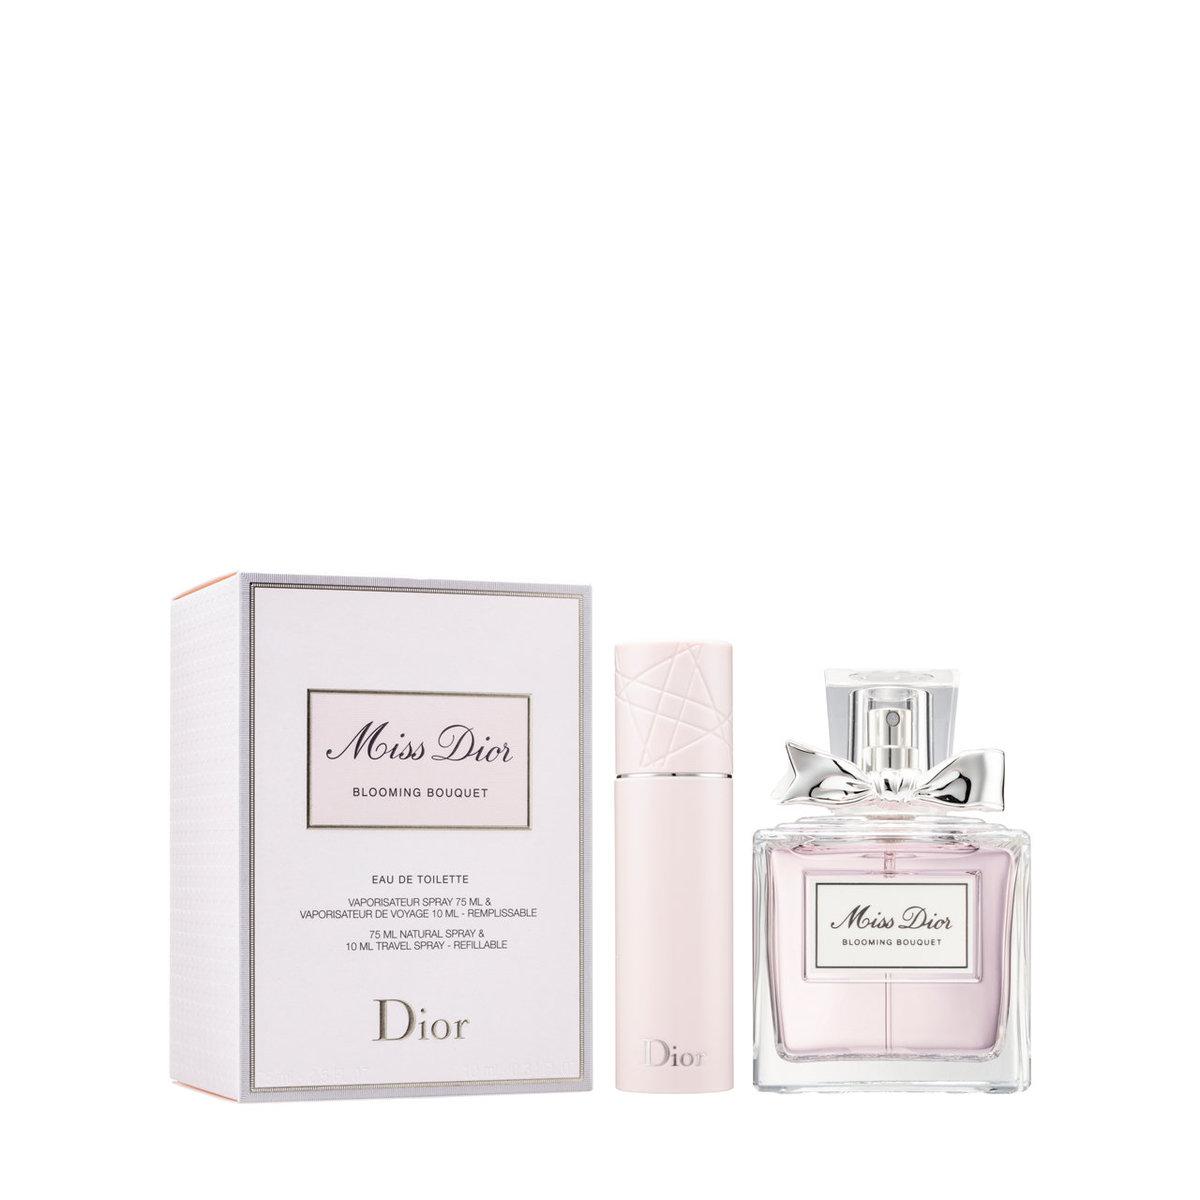 Miss Dior Blooming Bouquet EDT Set (2pcs) [Parallel Import]